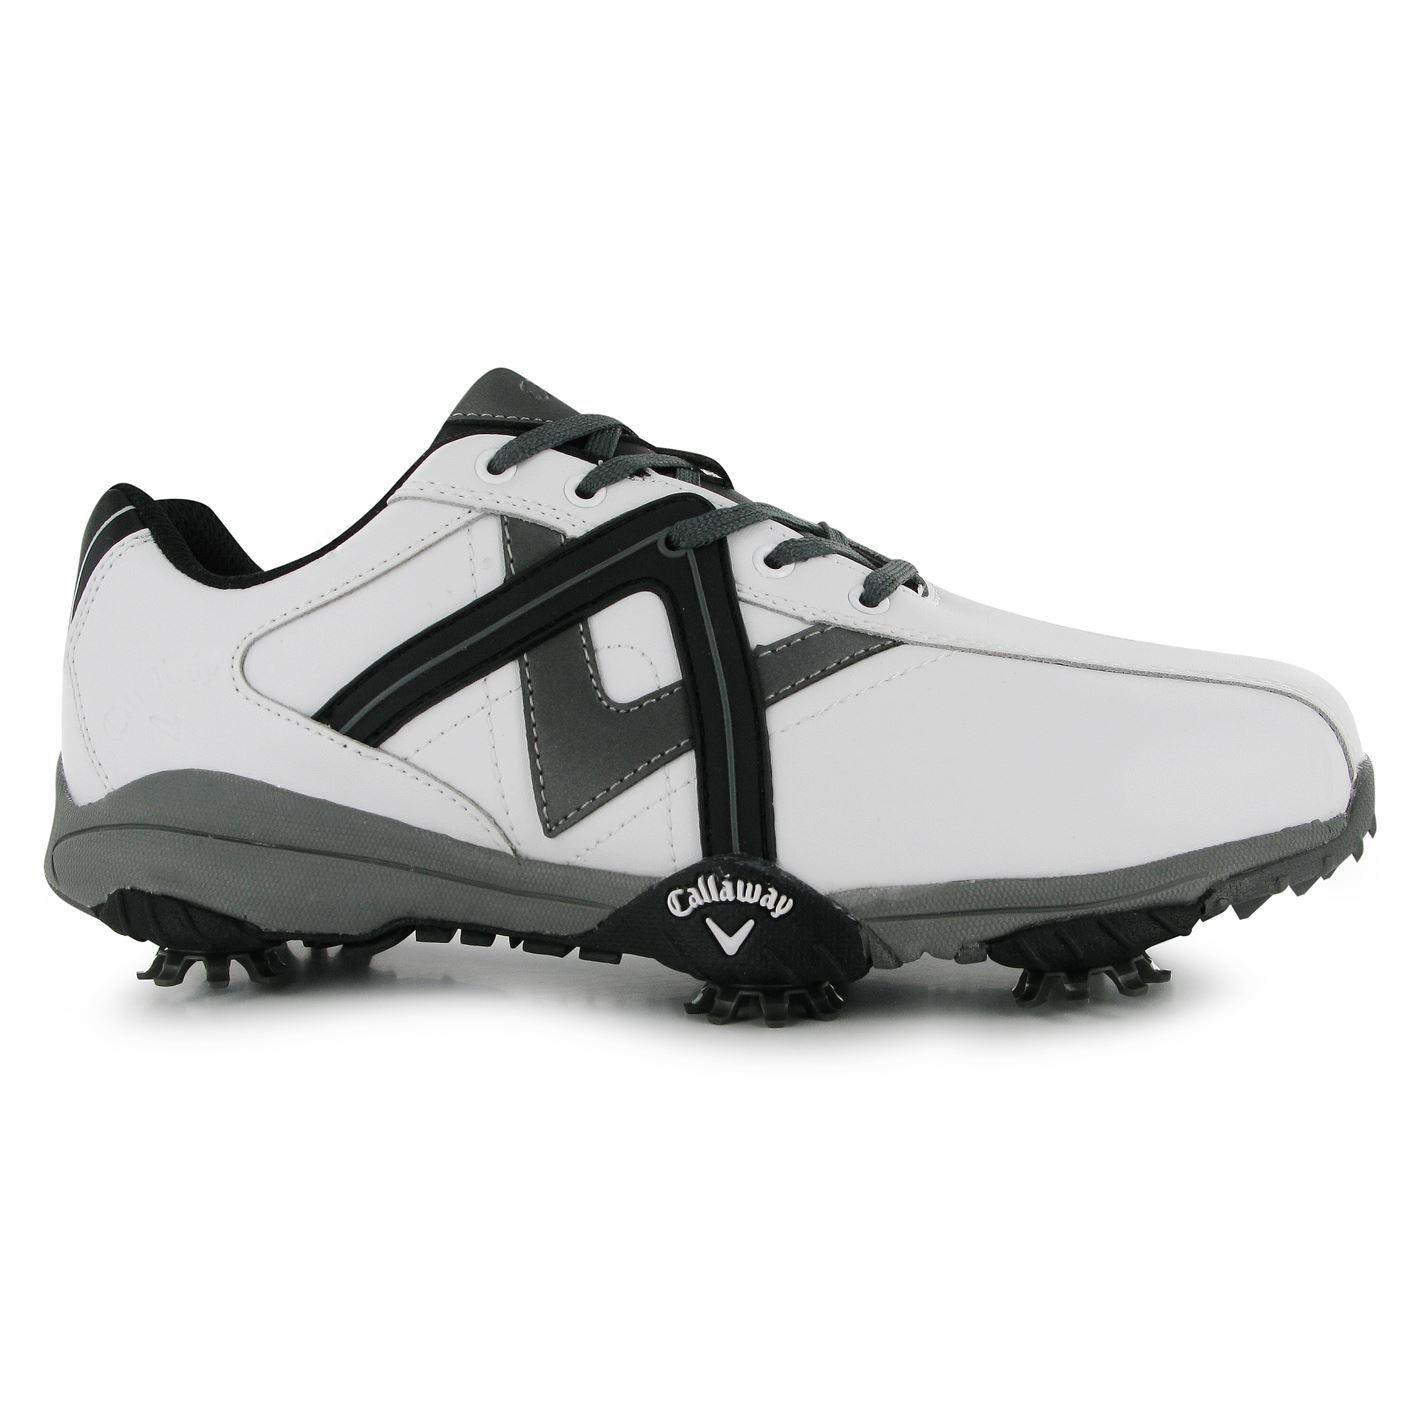 Callaway-Cheviot-ll-Golf-Shoes-Mens-Spikes-Footwear thumbnail 12